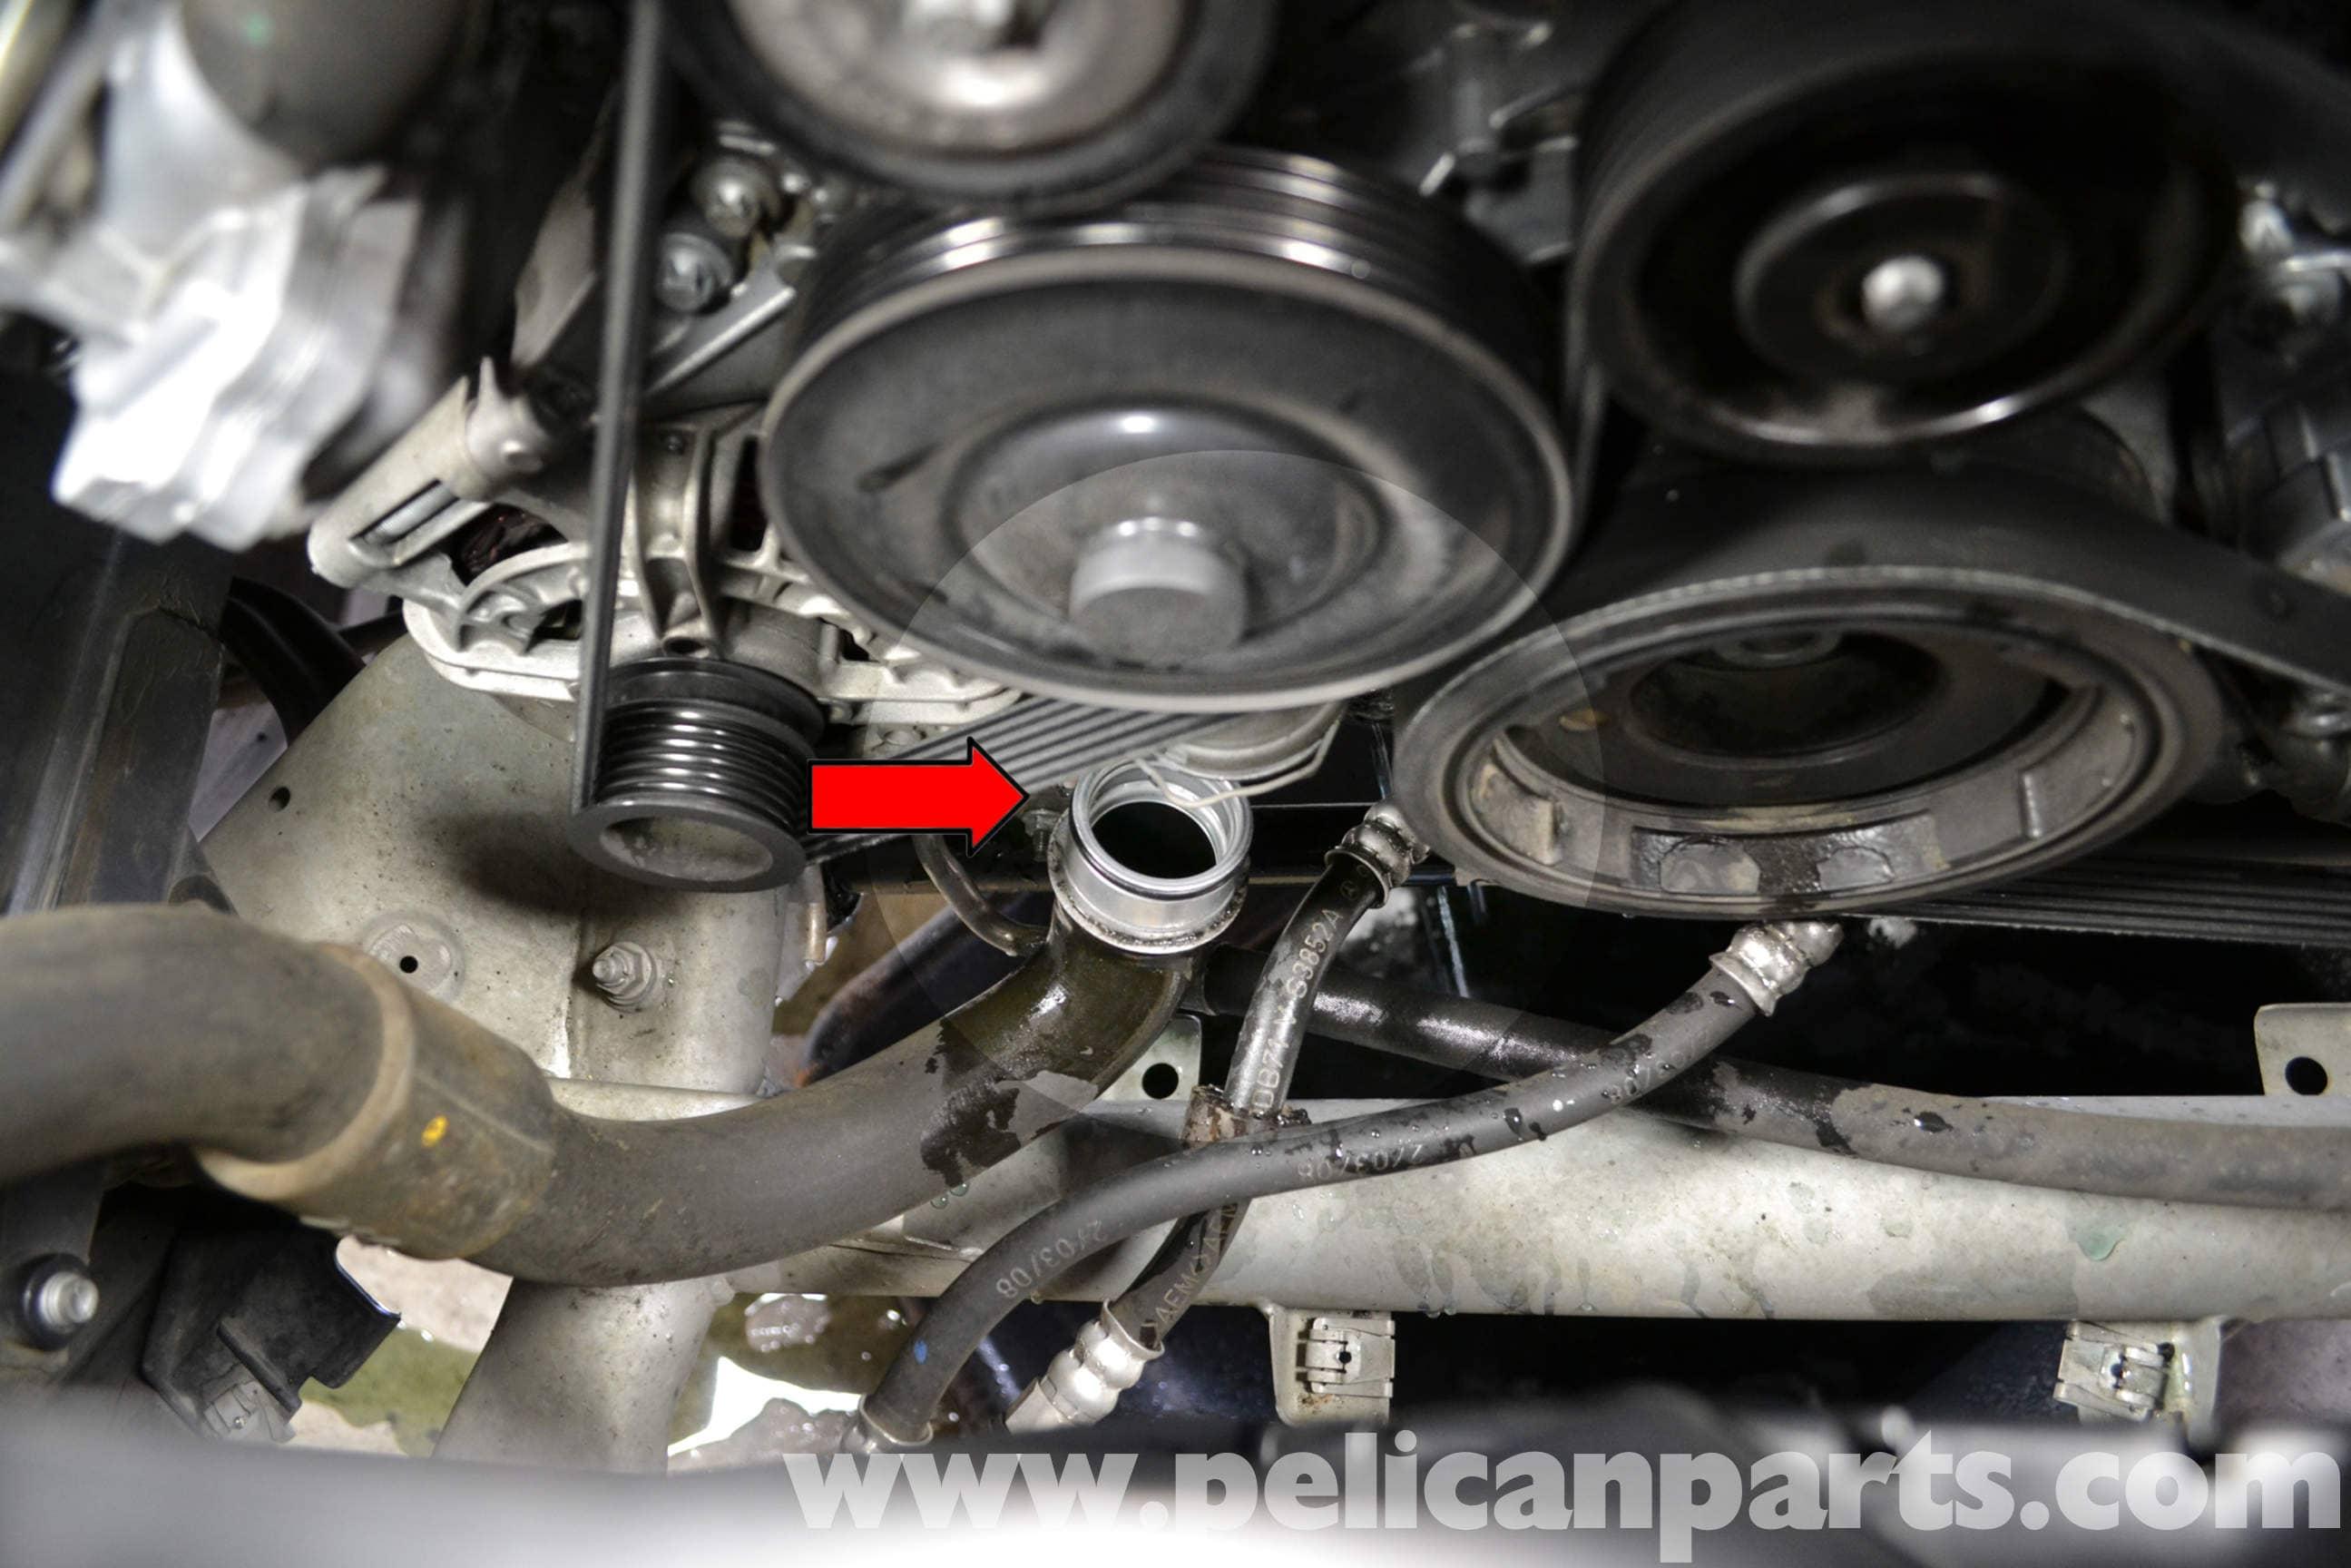 Mercedes-Benz W204 Coolant Pump Replacement - (2008-2014